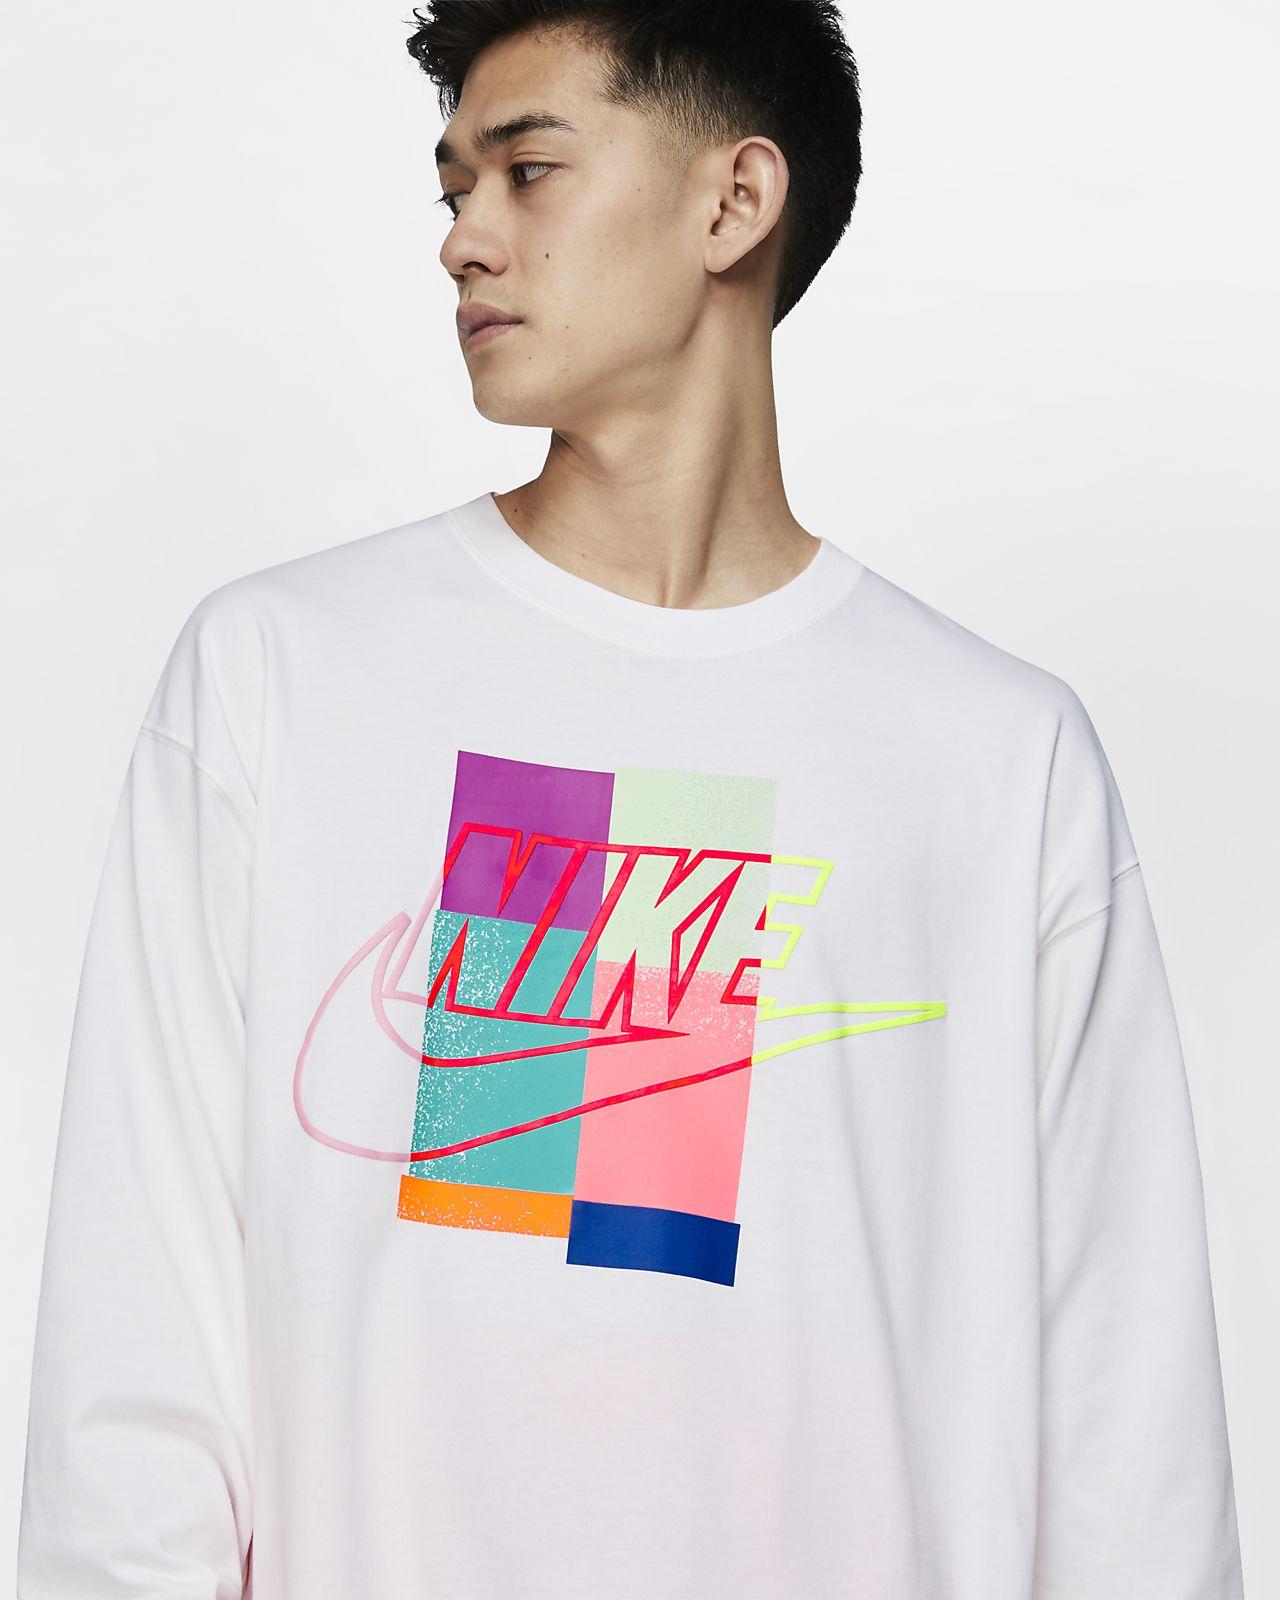 Nike x atmos Men's Long Sleeve T Shirt